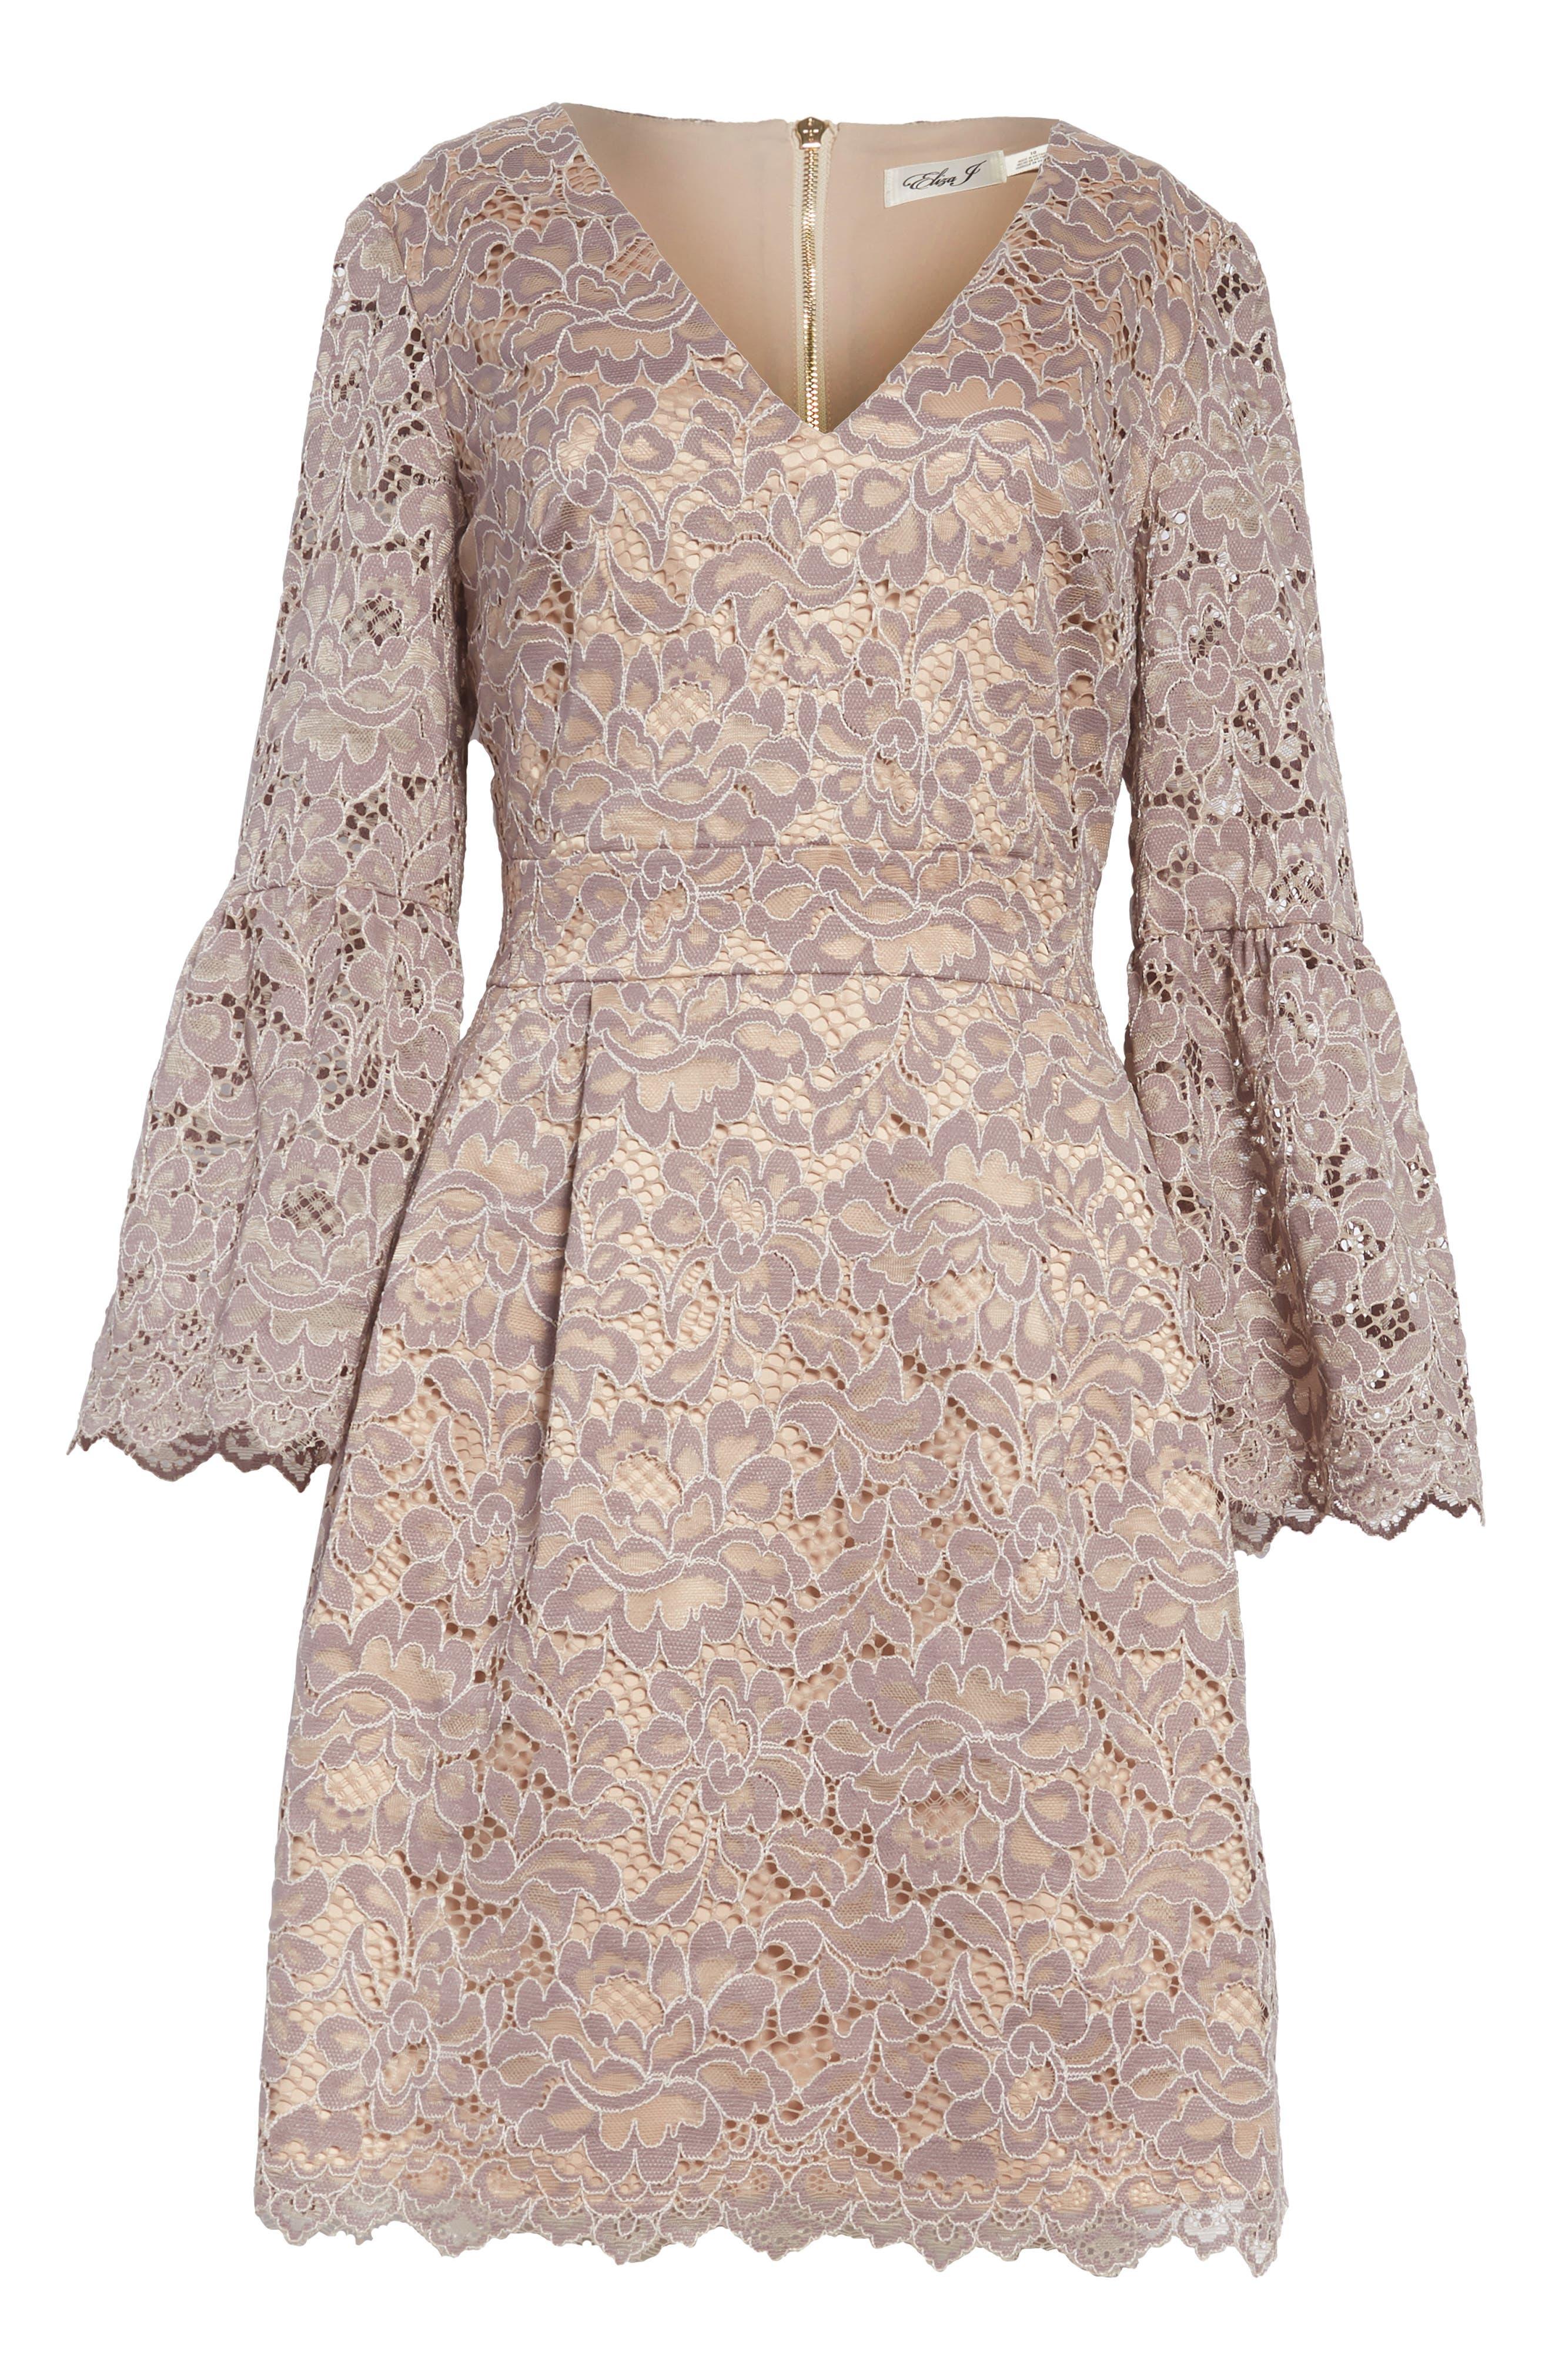 Lace Fit & Flare Dress,                             Alternate thumbnail 8, color,                             030